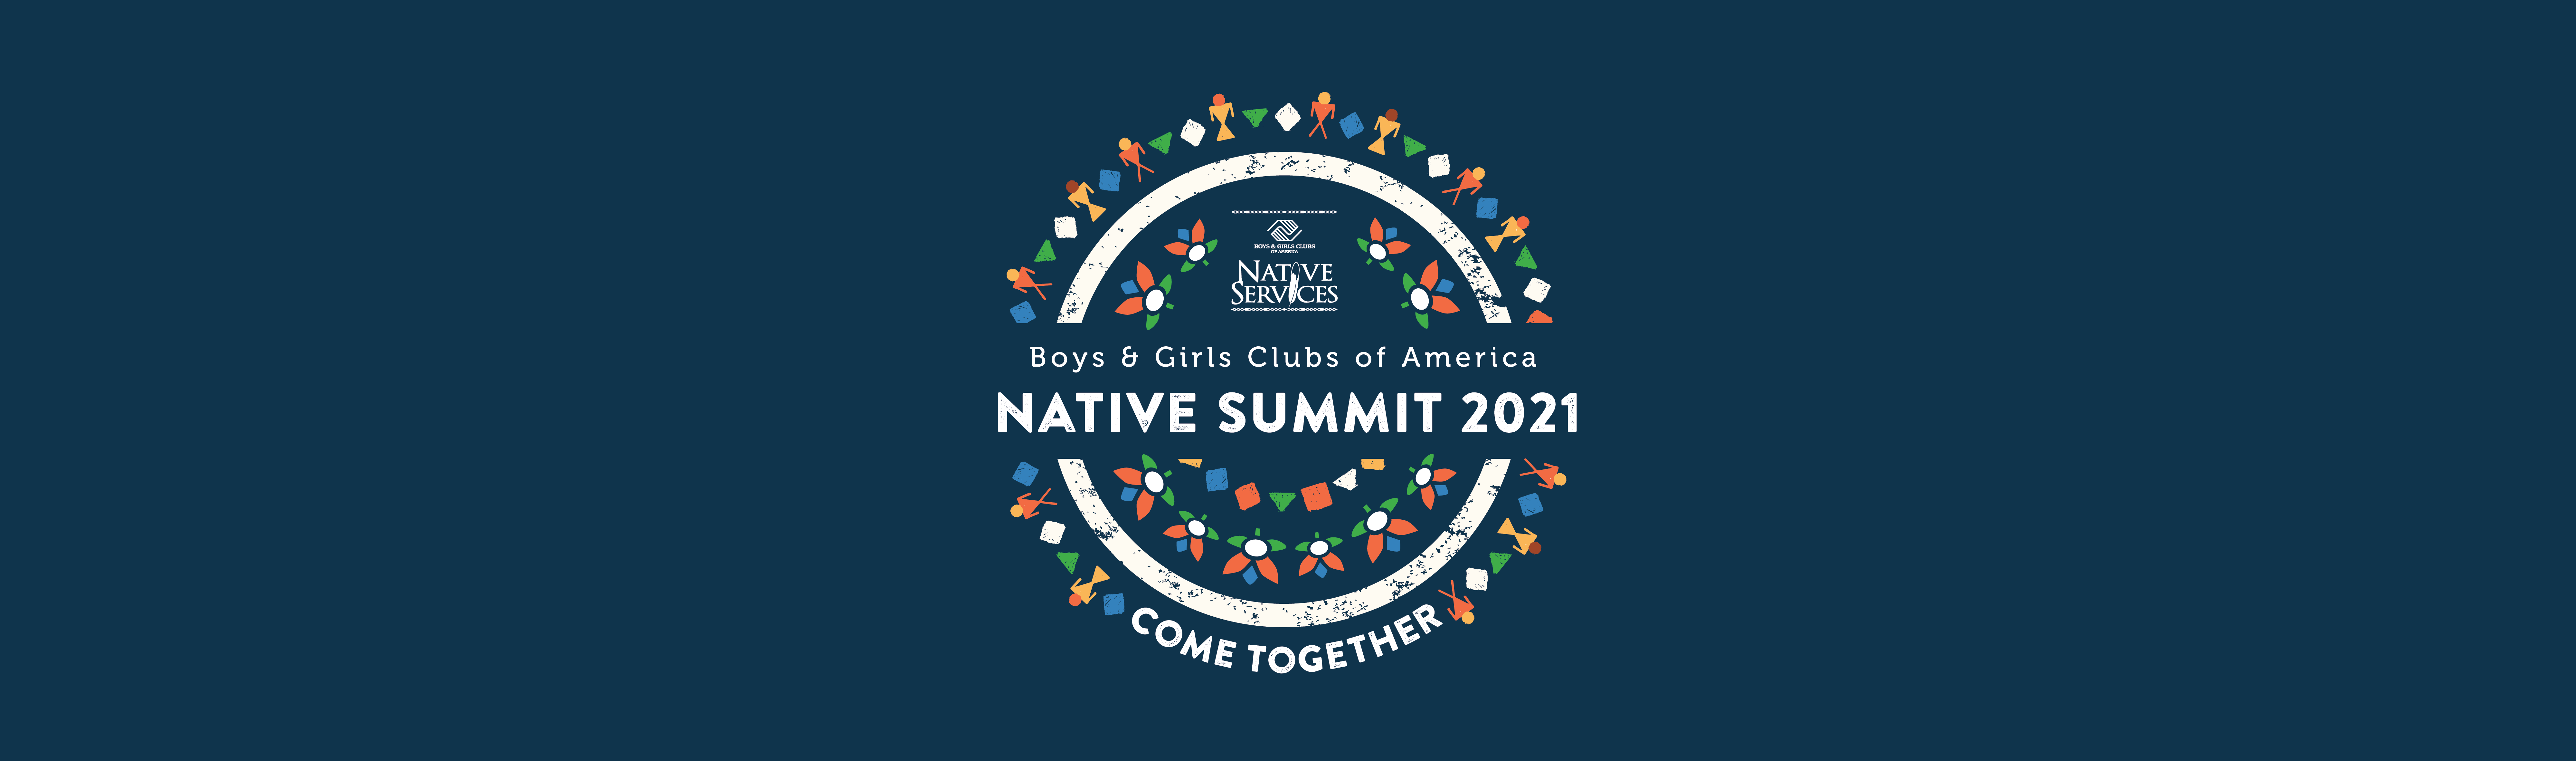 2021 Native Summit